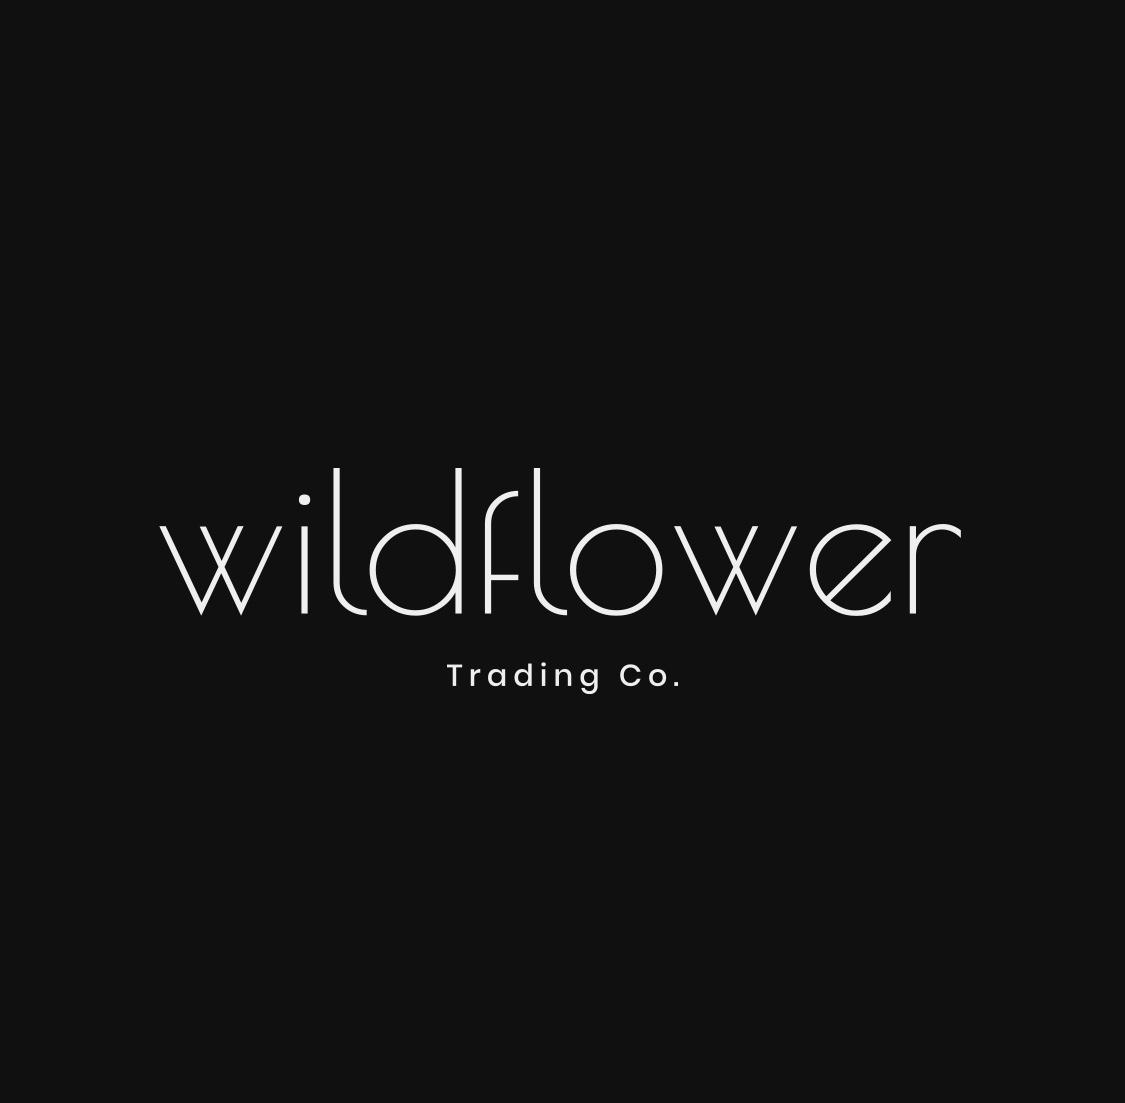 Wildflower Trading Company